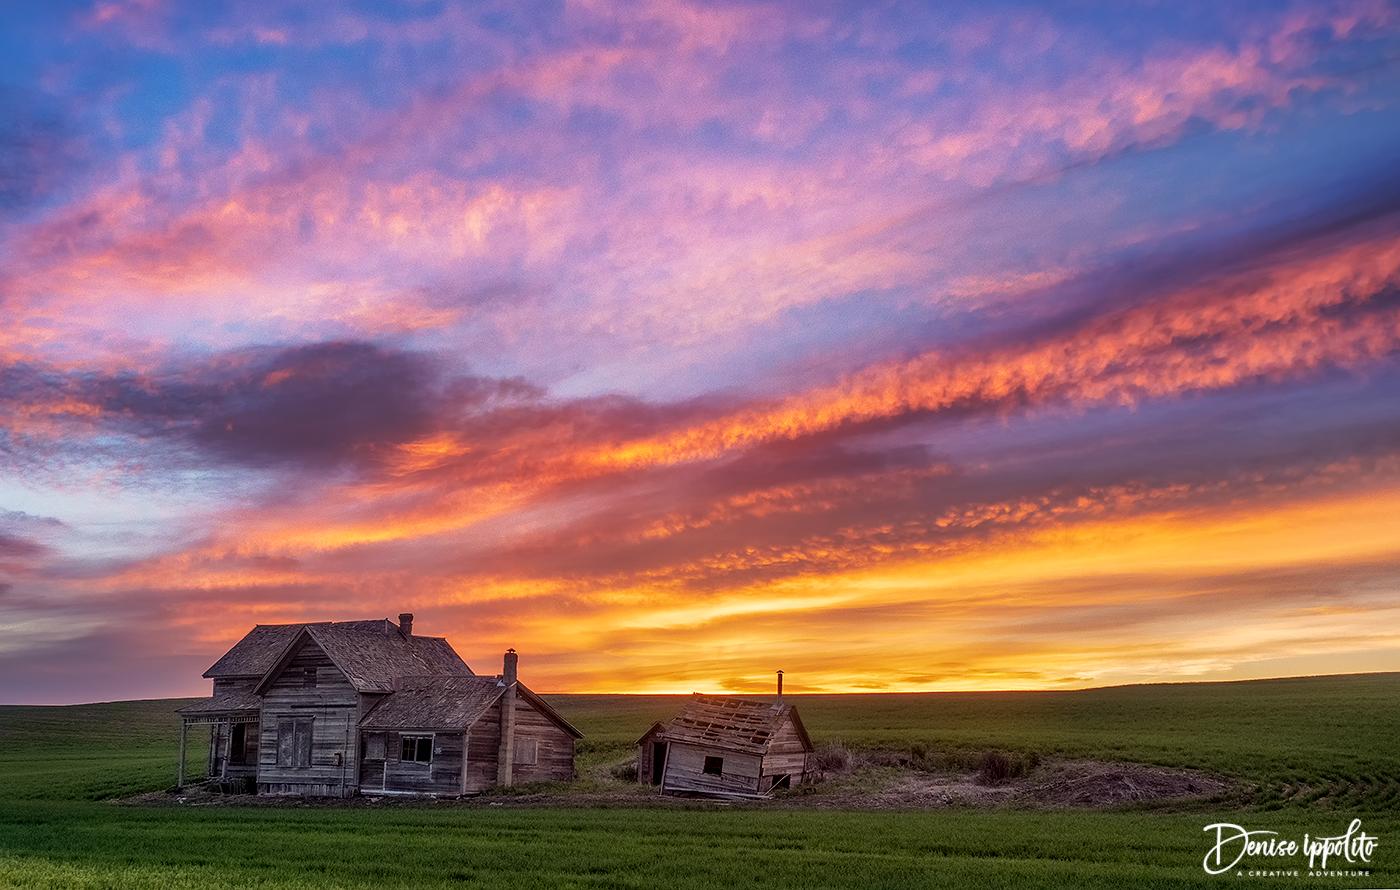 A glorious morning sunrise